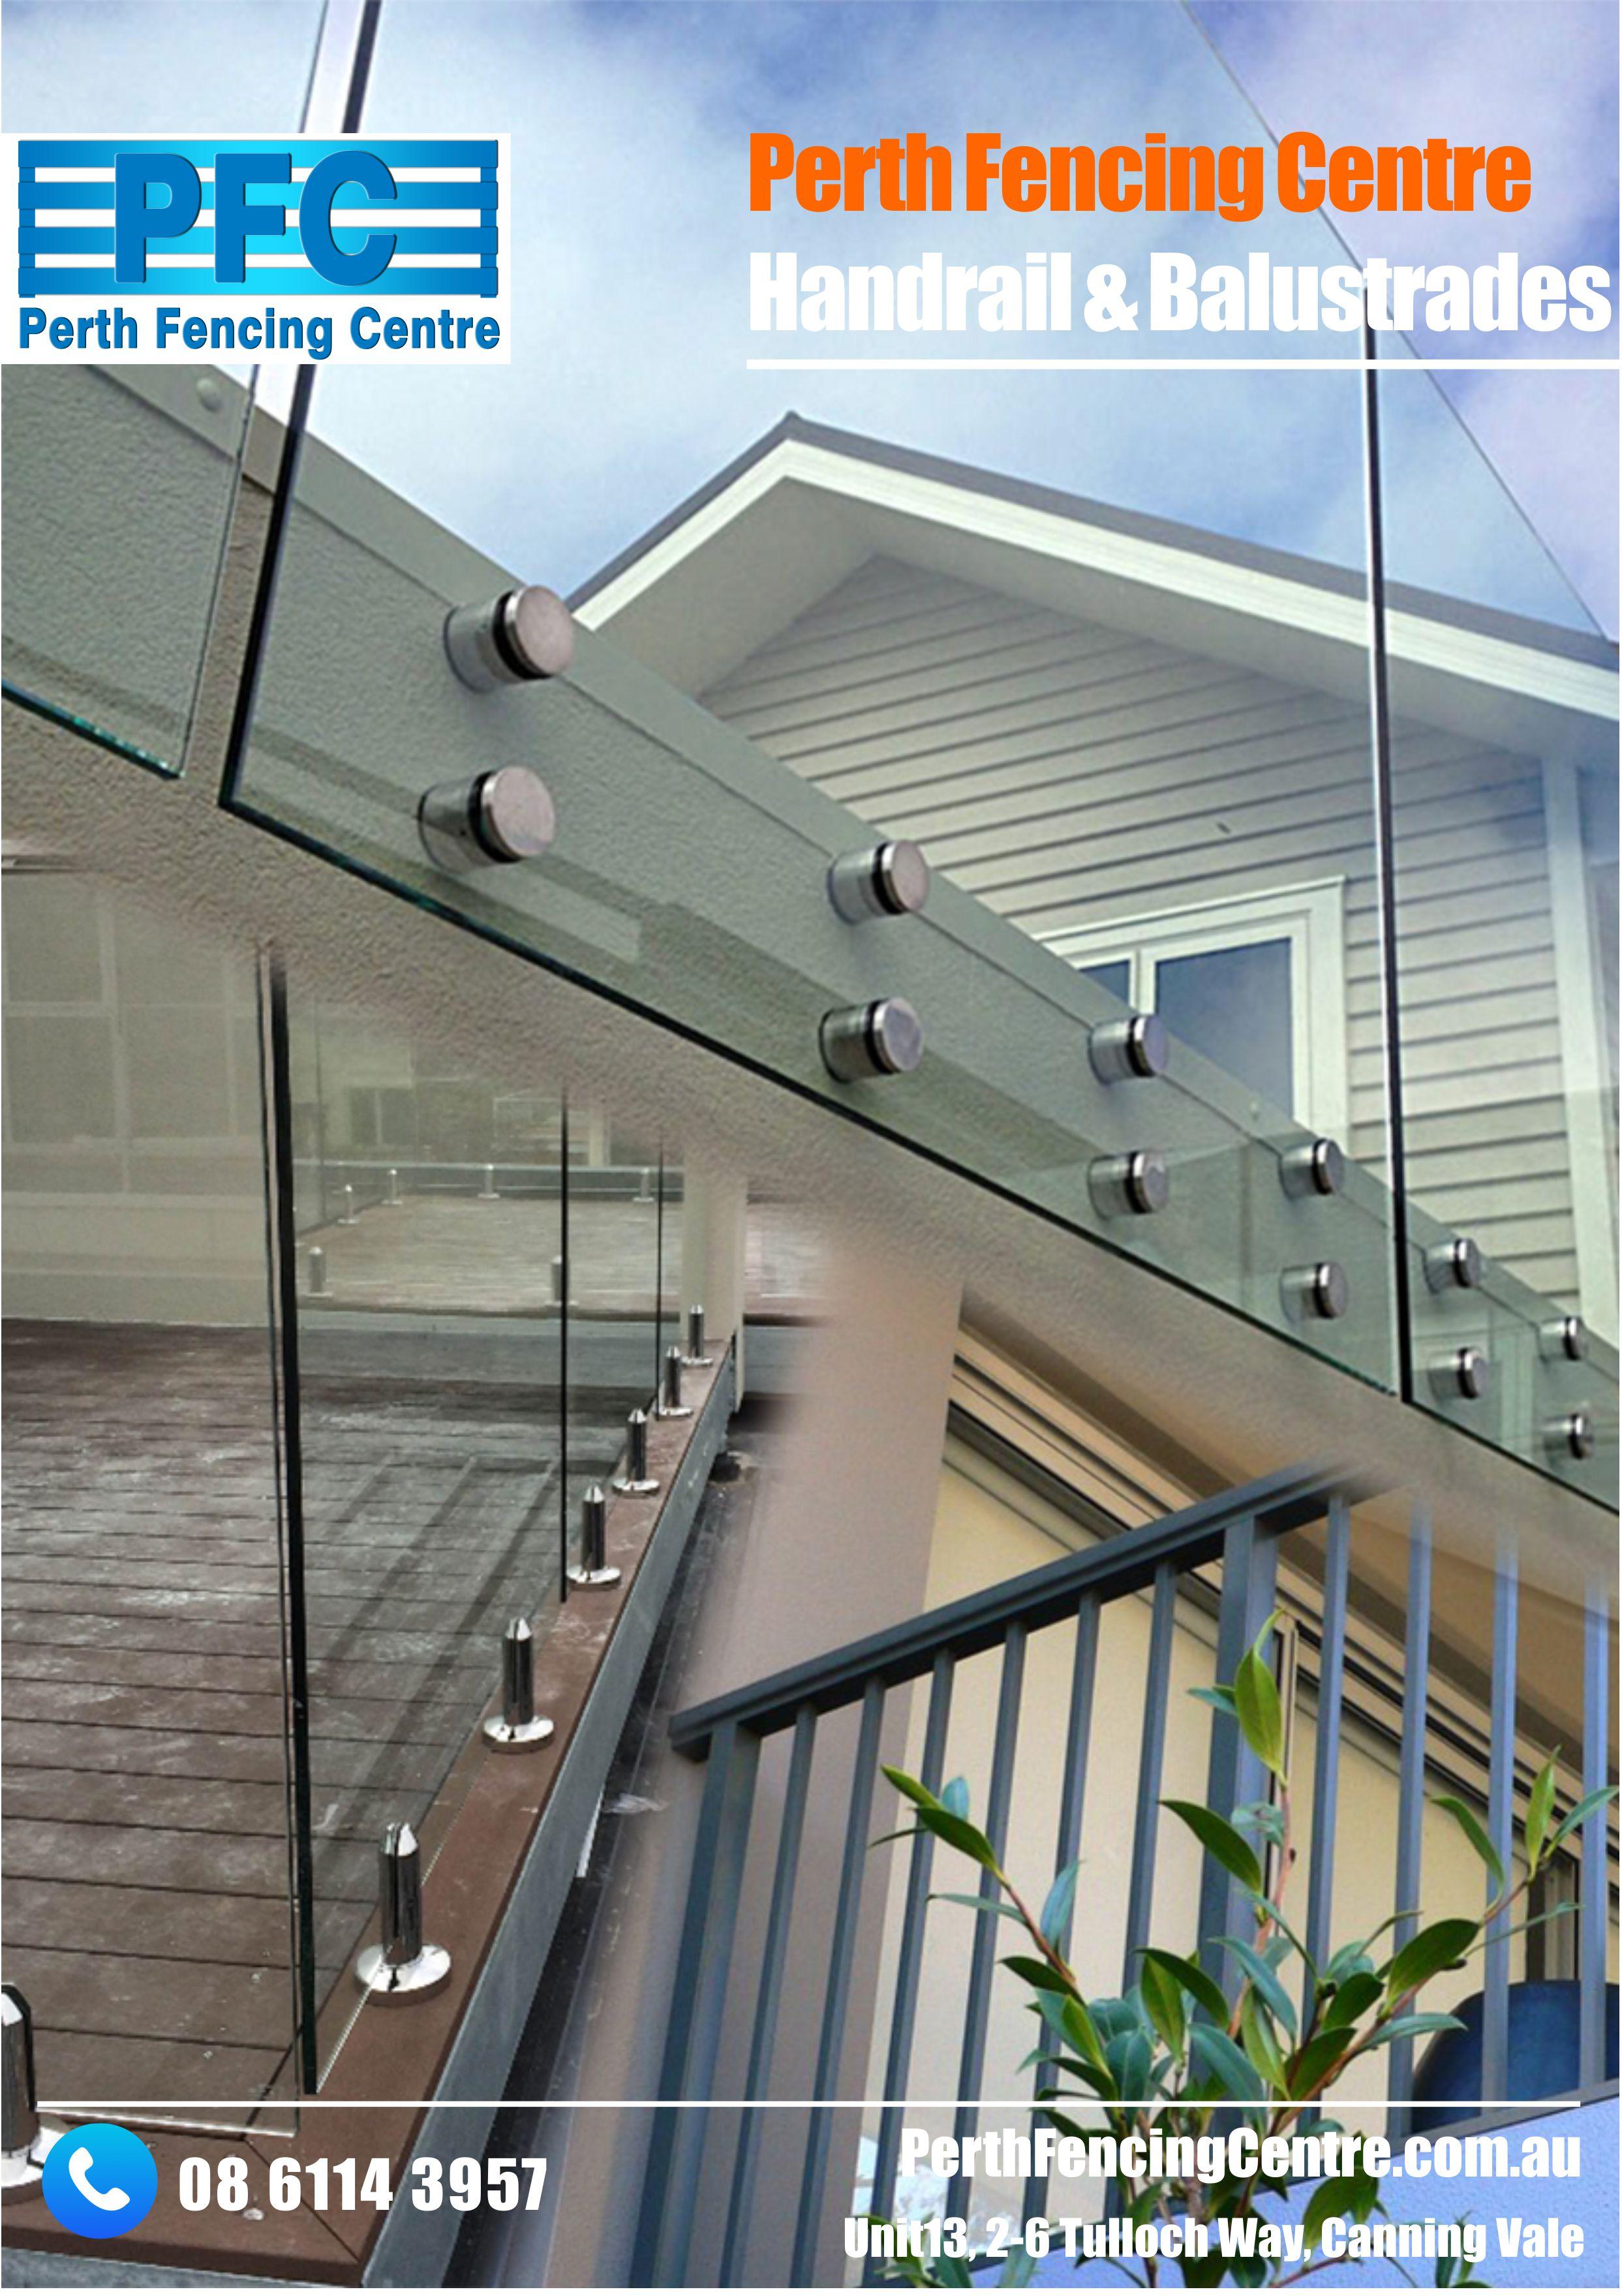 PFC - Handrail and Balustrades